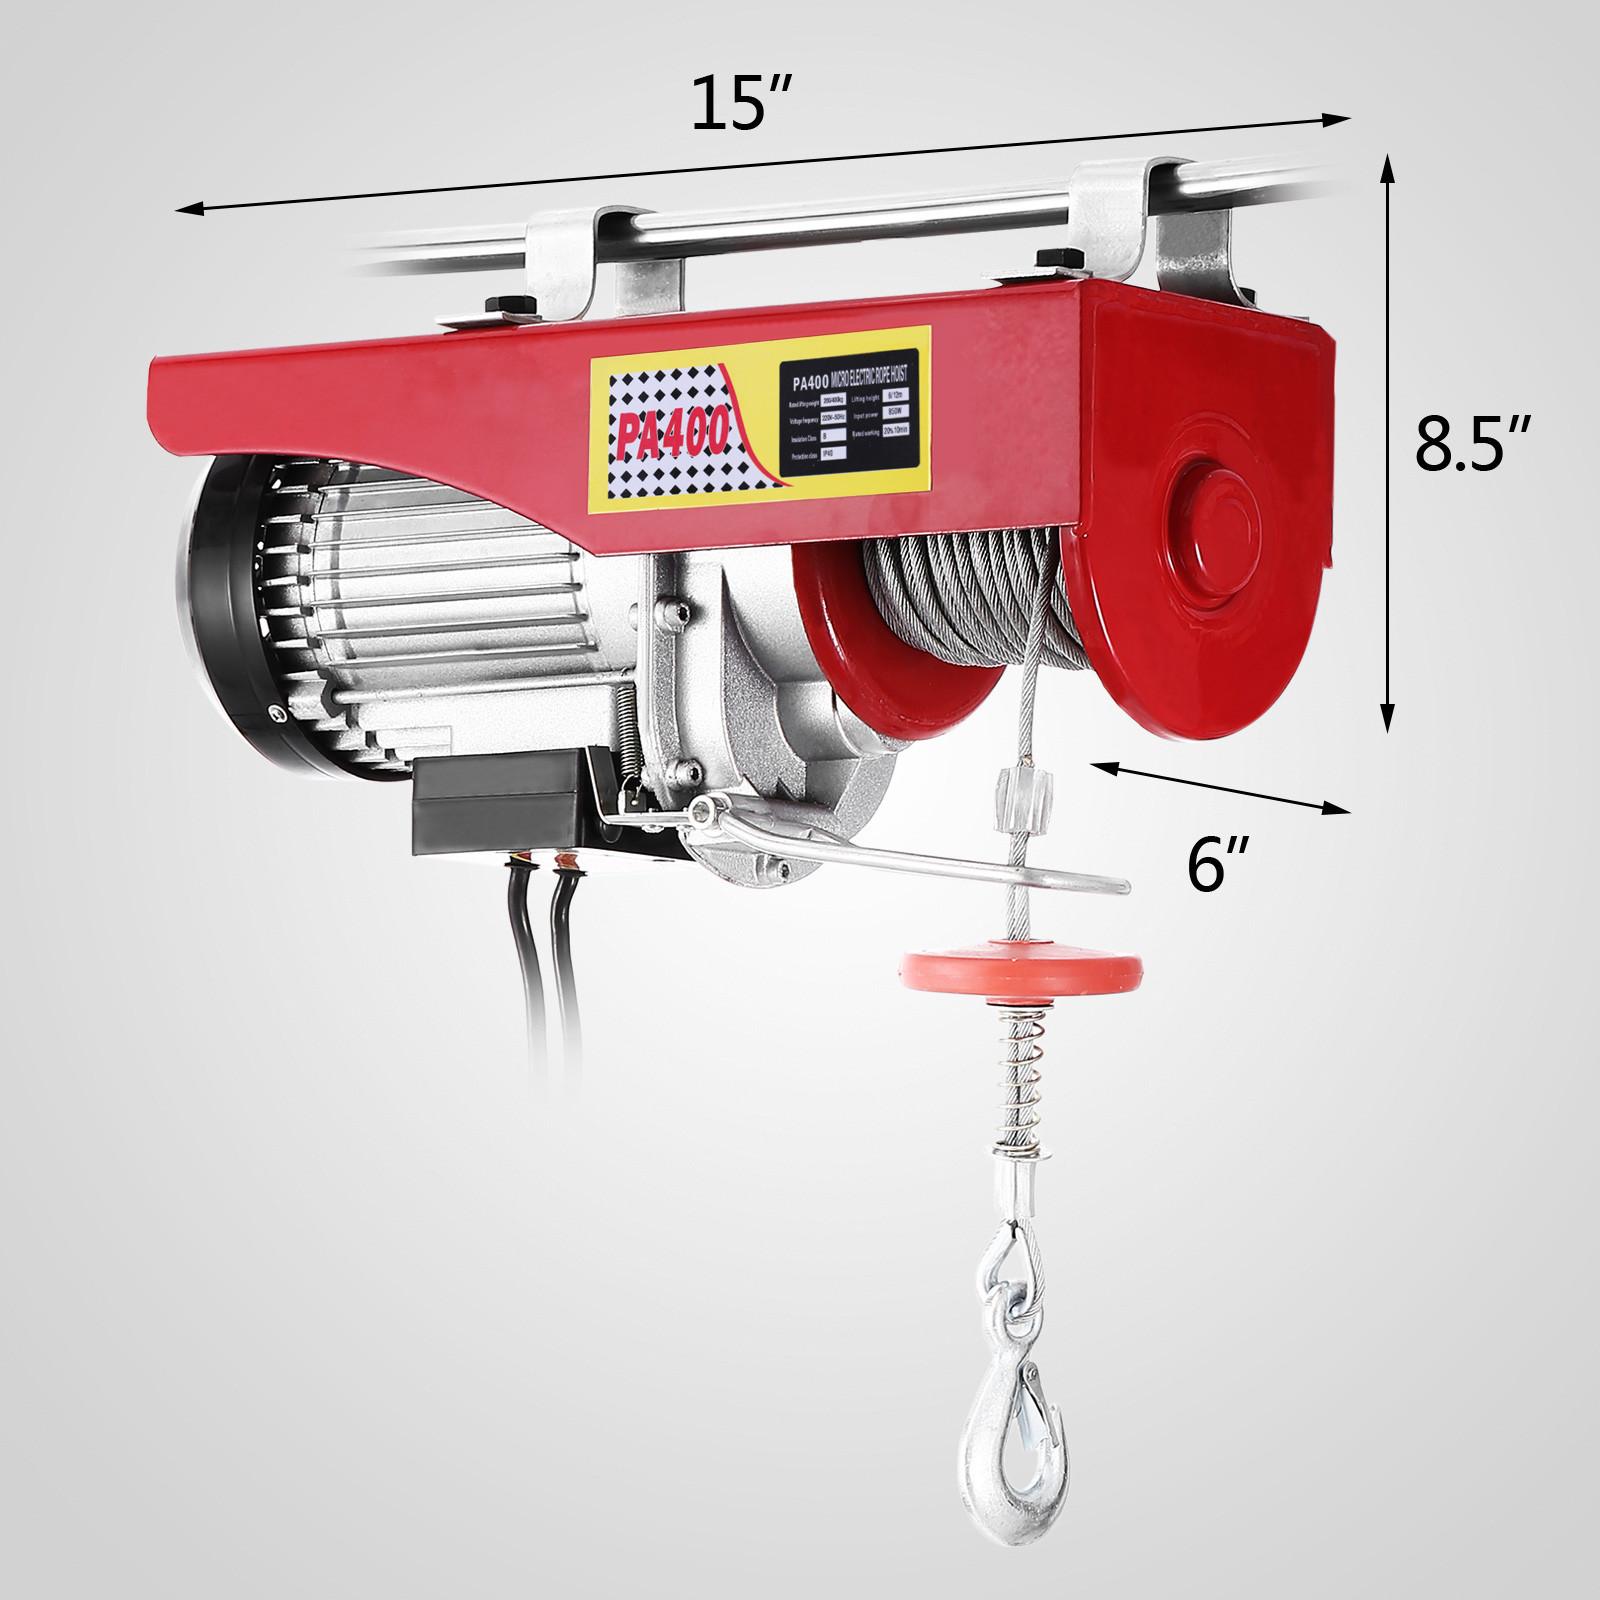 100kg-900kg-Electric-Hoist-Winch-Lifting-Engine-Crane-Cable-Lift-Hook-Garage miniature 26